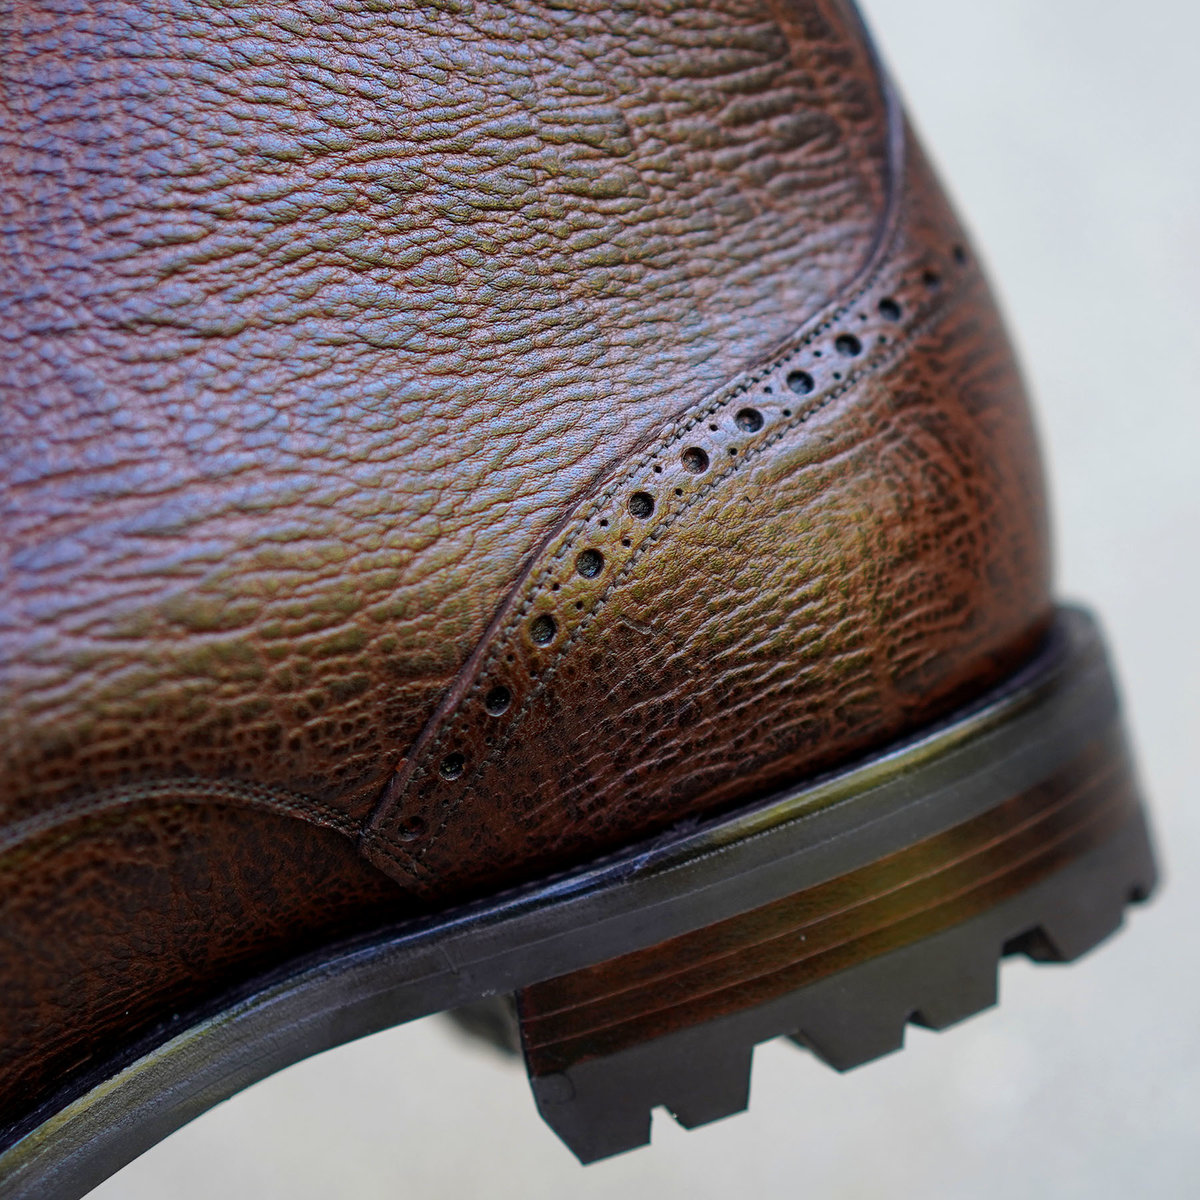 GG Boot Rear Heel.jpg